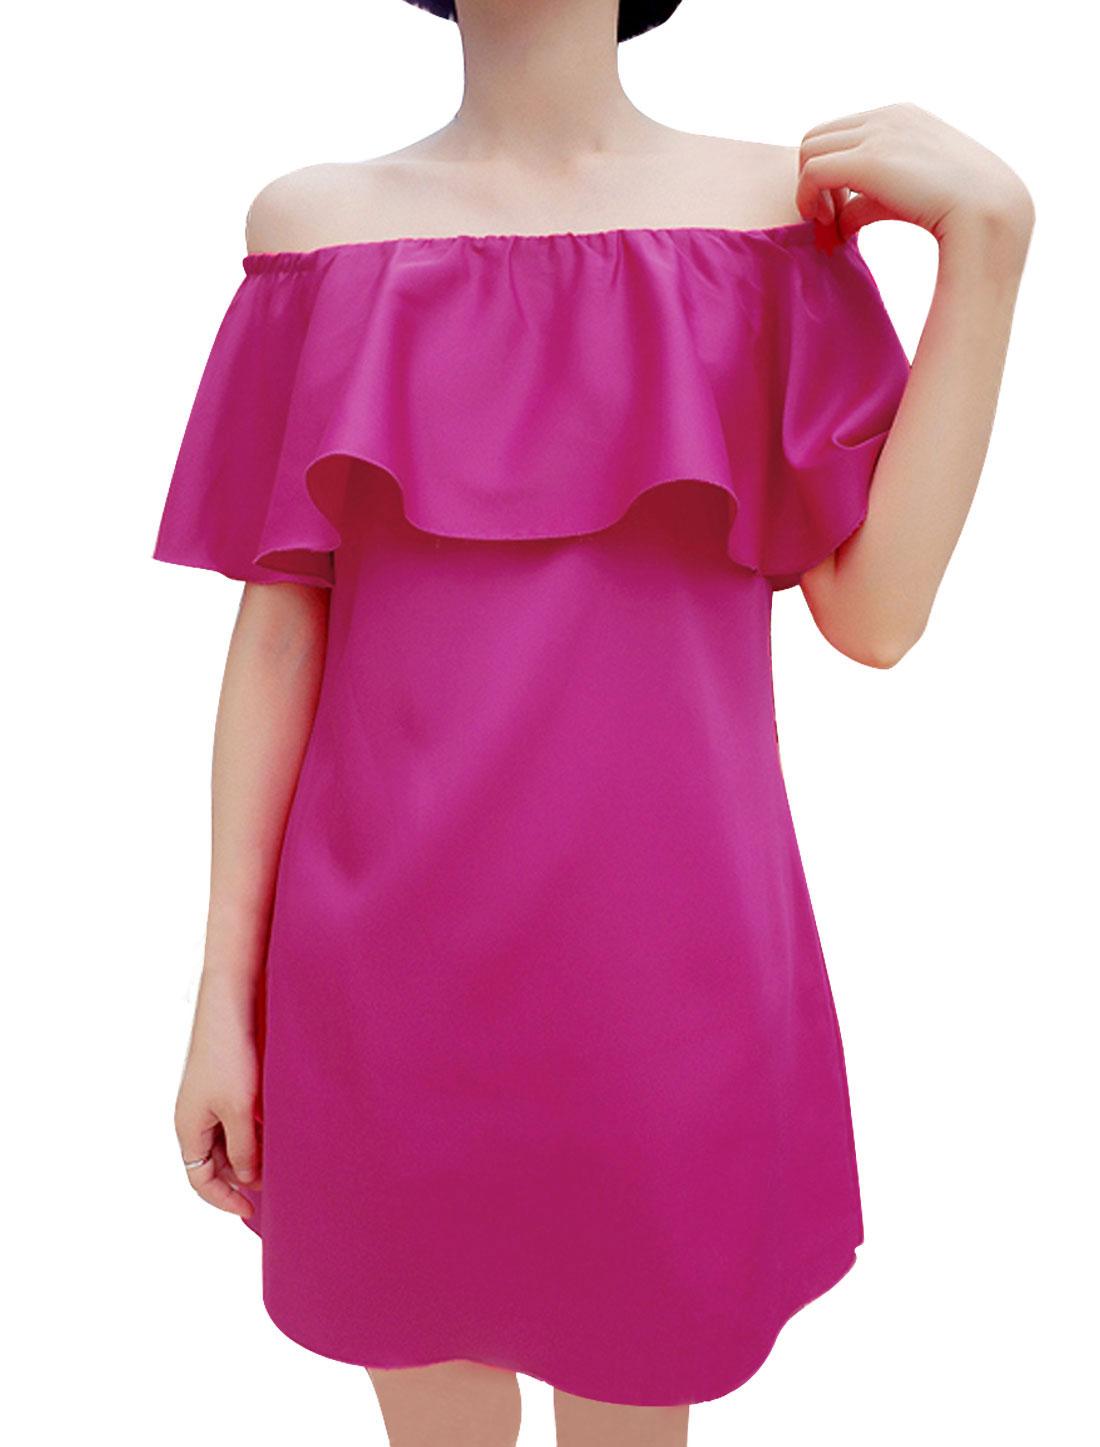 Lady Off Shoulder Flouncing Design Zipper Back Dress Fuchsia M